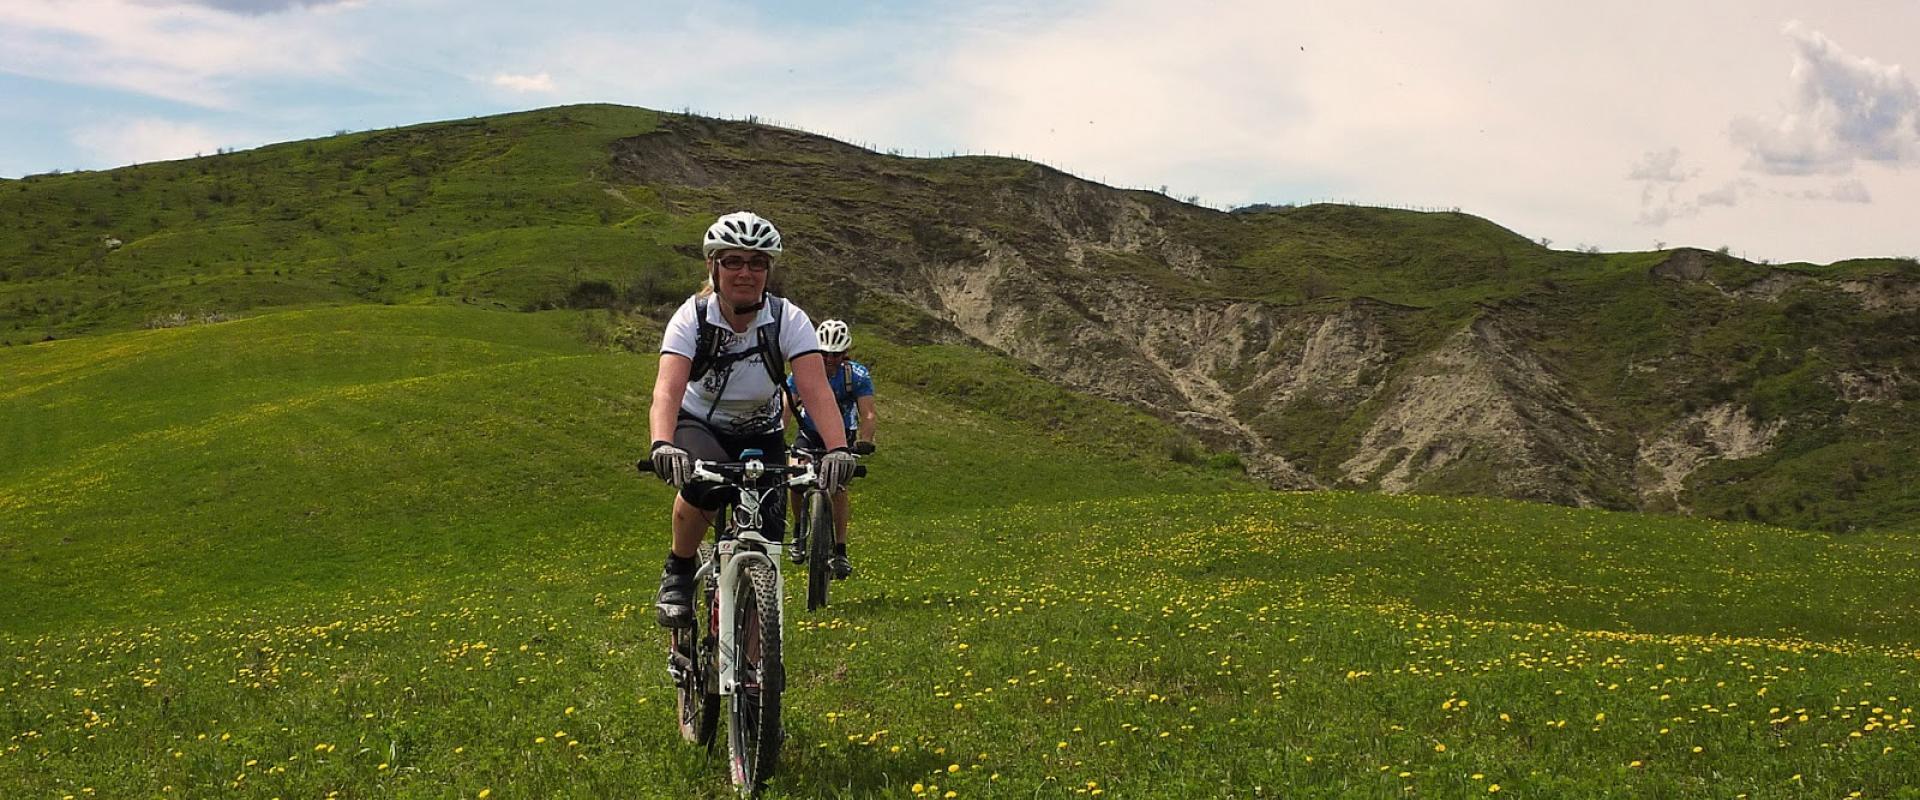 Mountain bike experience in Umbria